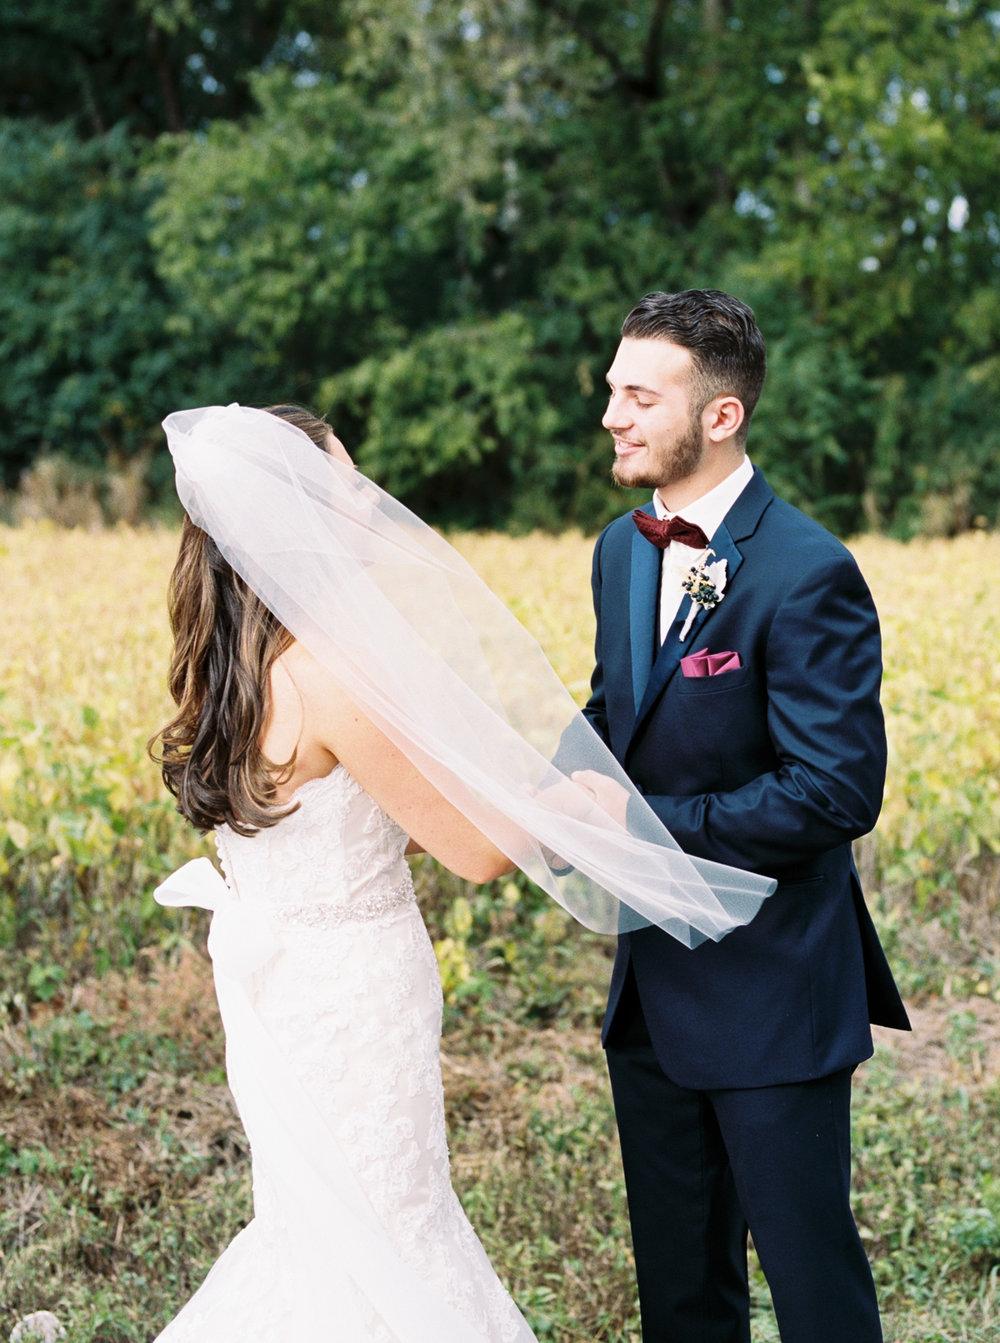 web casey + alec wren's nest film wedding photographers ©2016abigailbobophotography-14.jpg